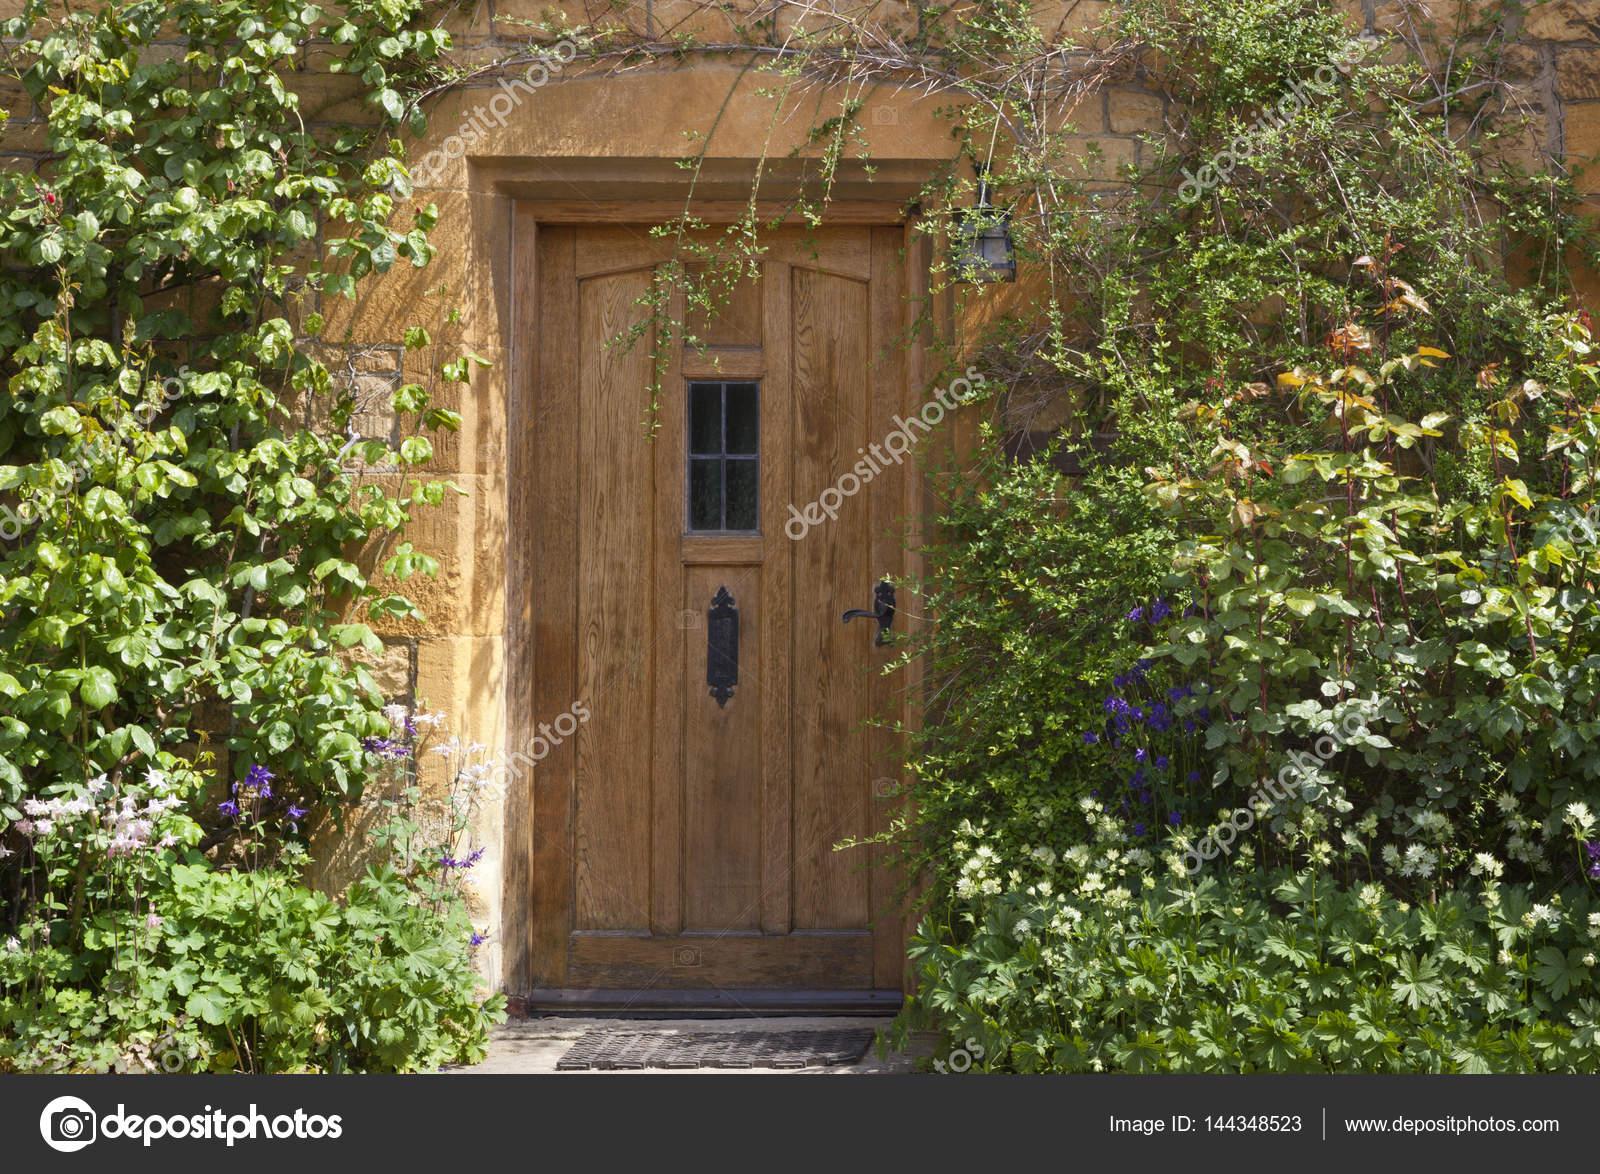 Portes de maison brune clair cottage anglais for Photos cottages anglais